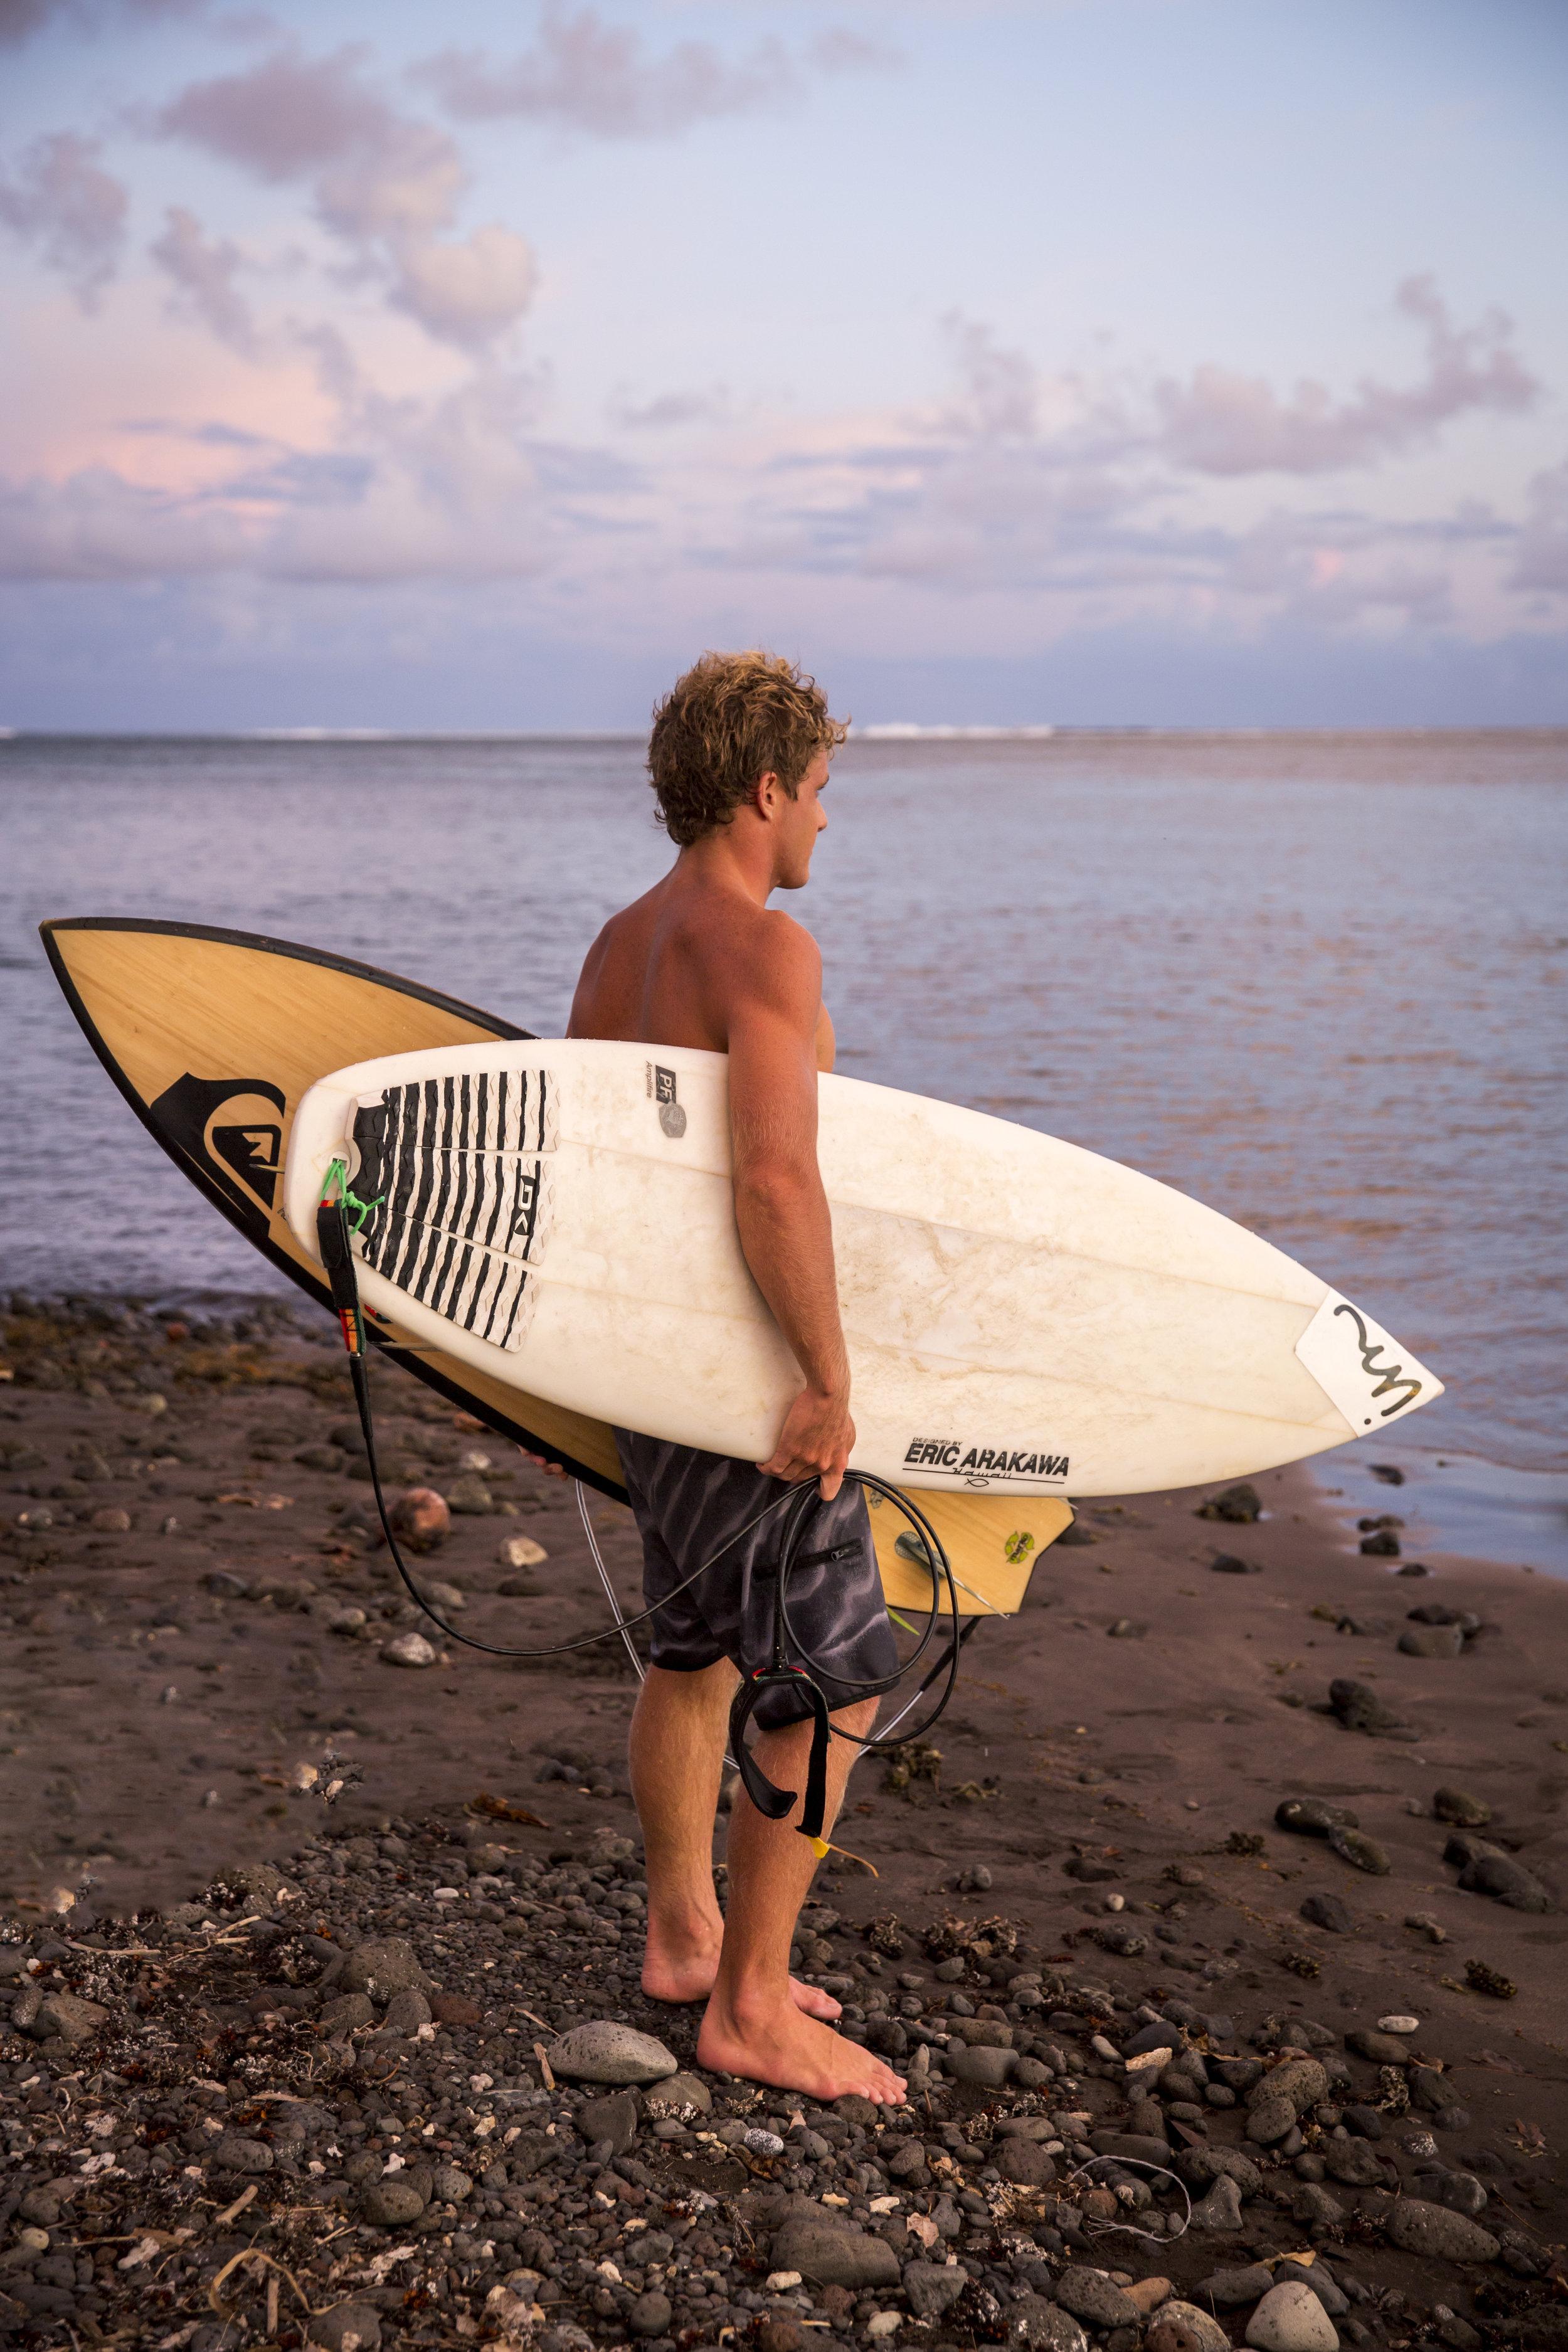 TashaVanZandt_02_Tahiti_BH6A3188.jpg